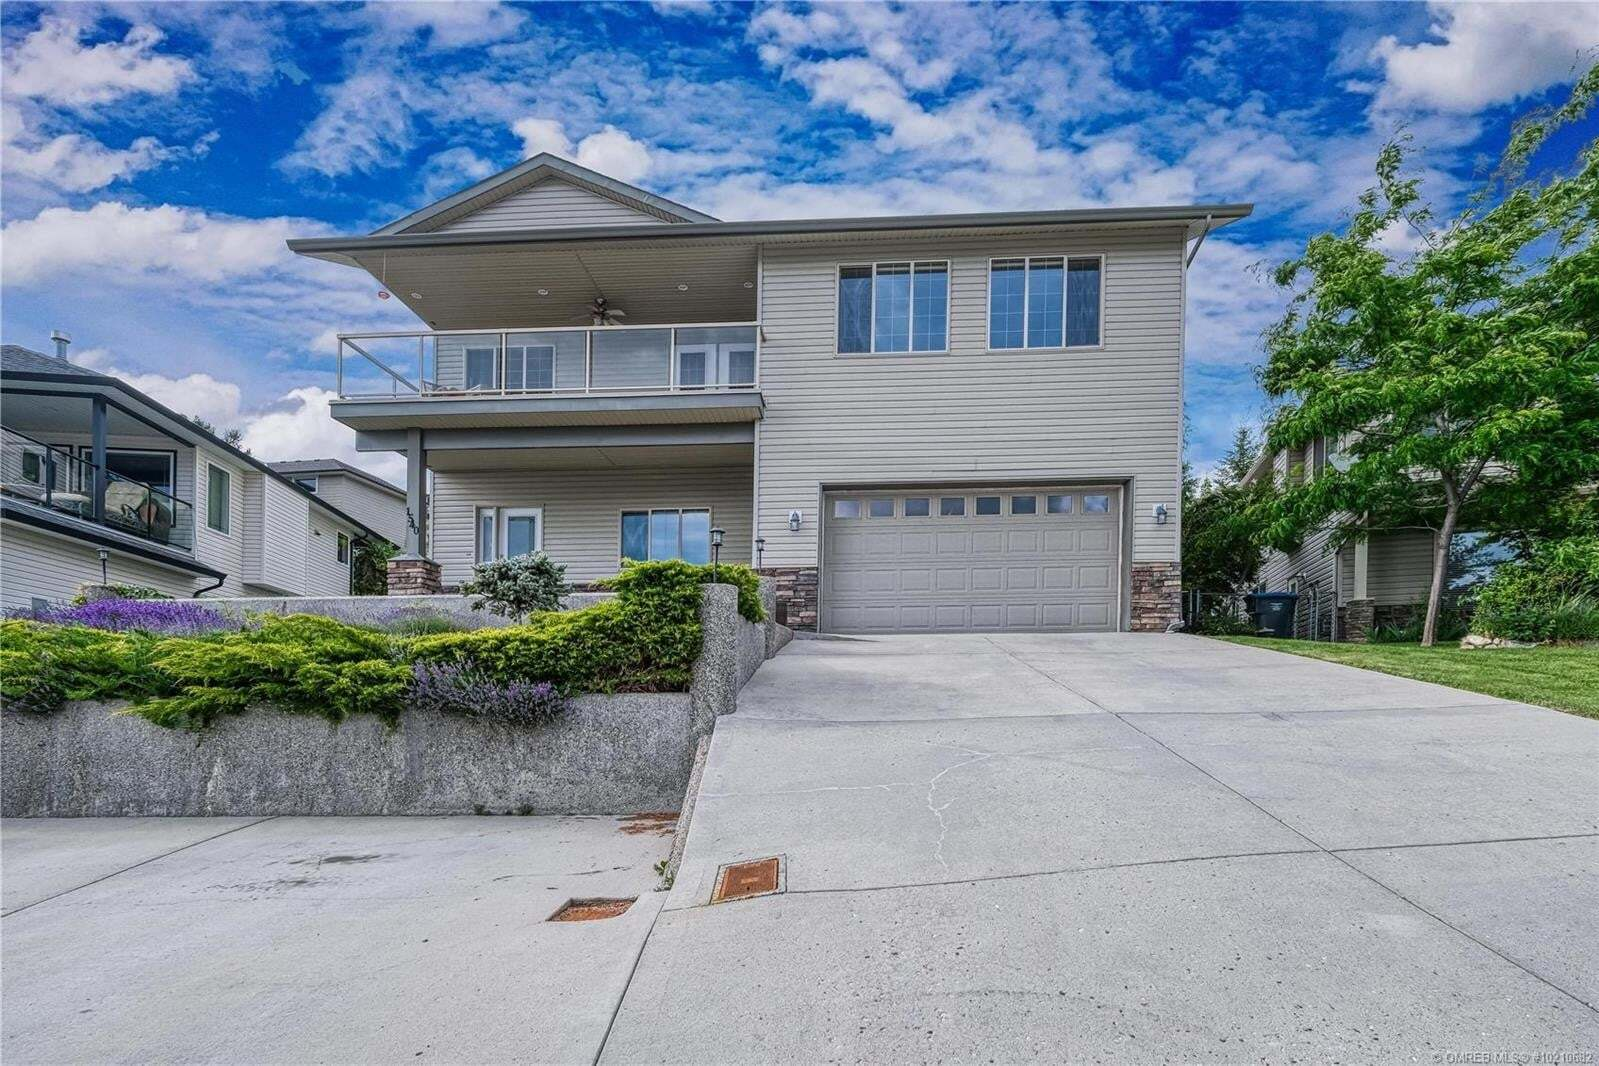 House for sale at 1540 Longley Cres Kelowna British Columbia - MLS: 10210682